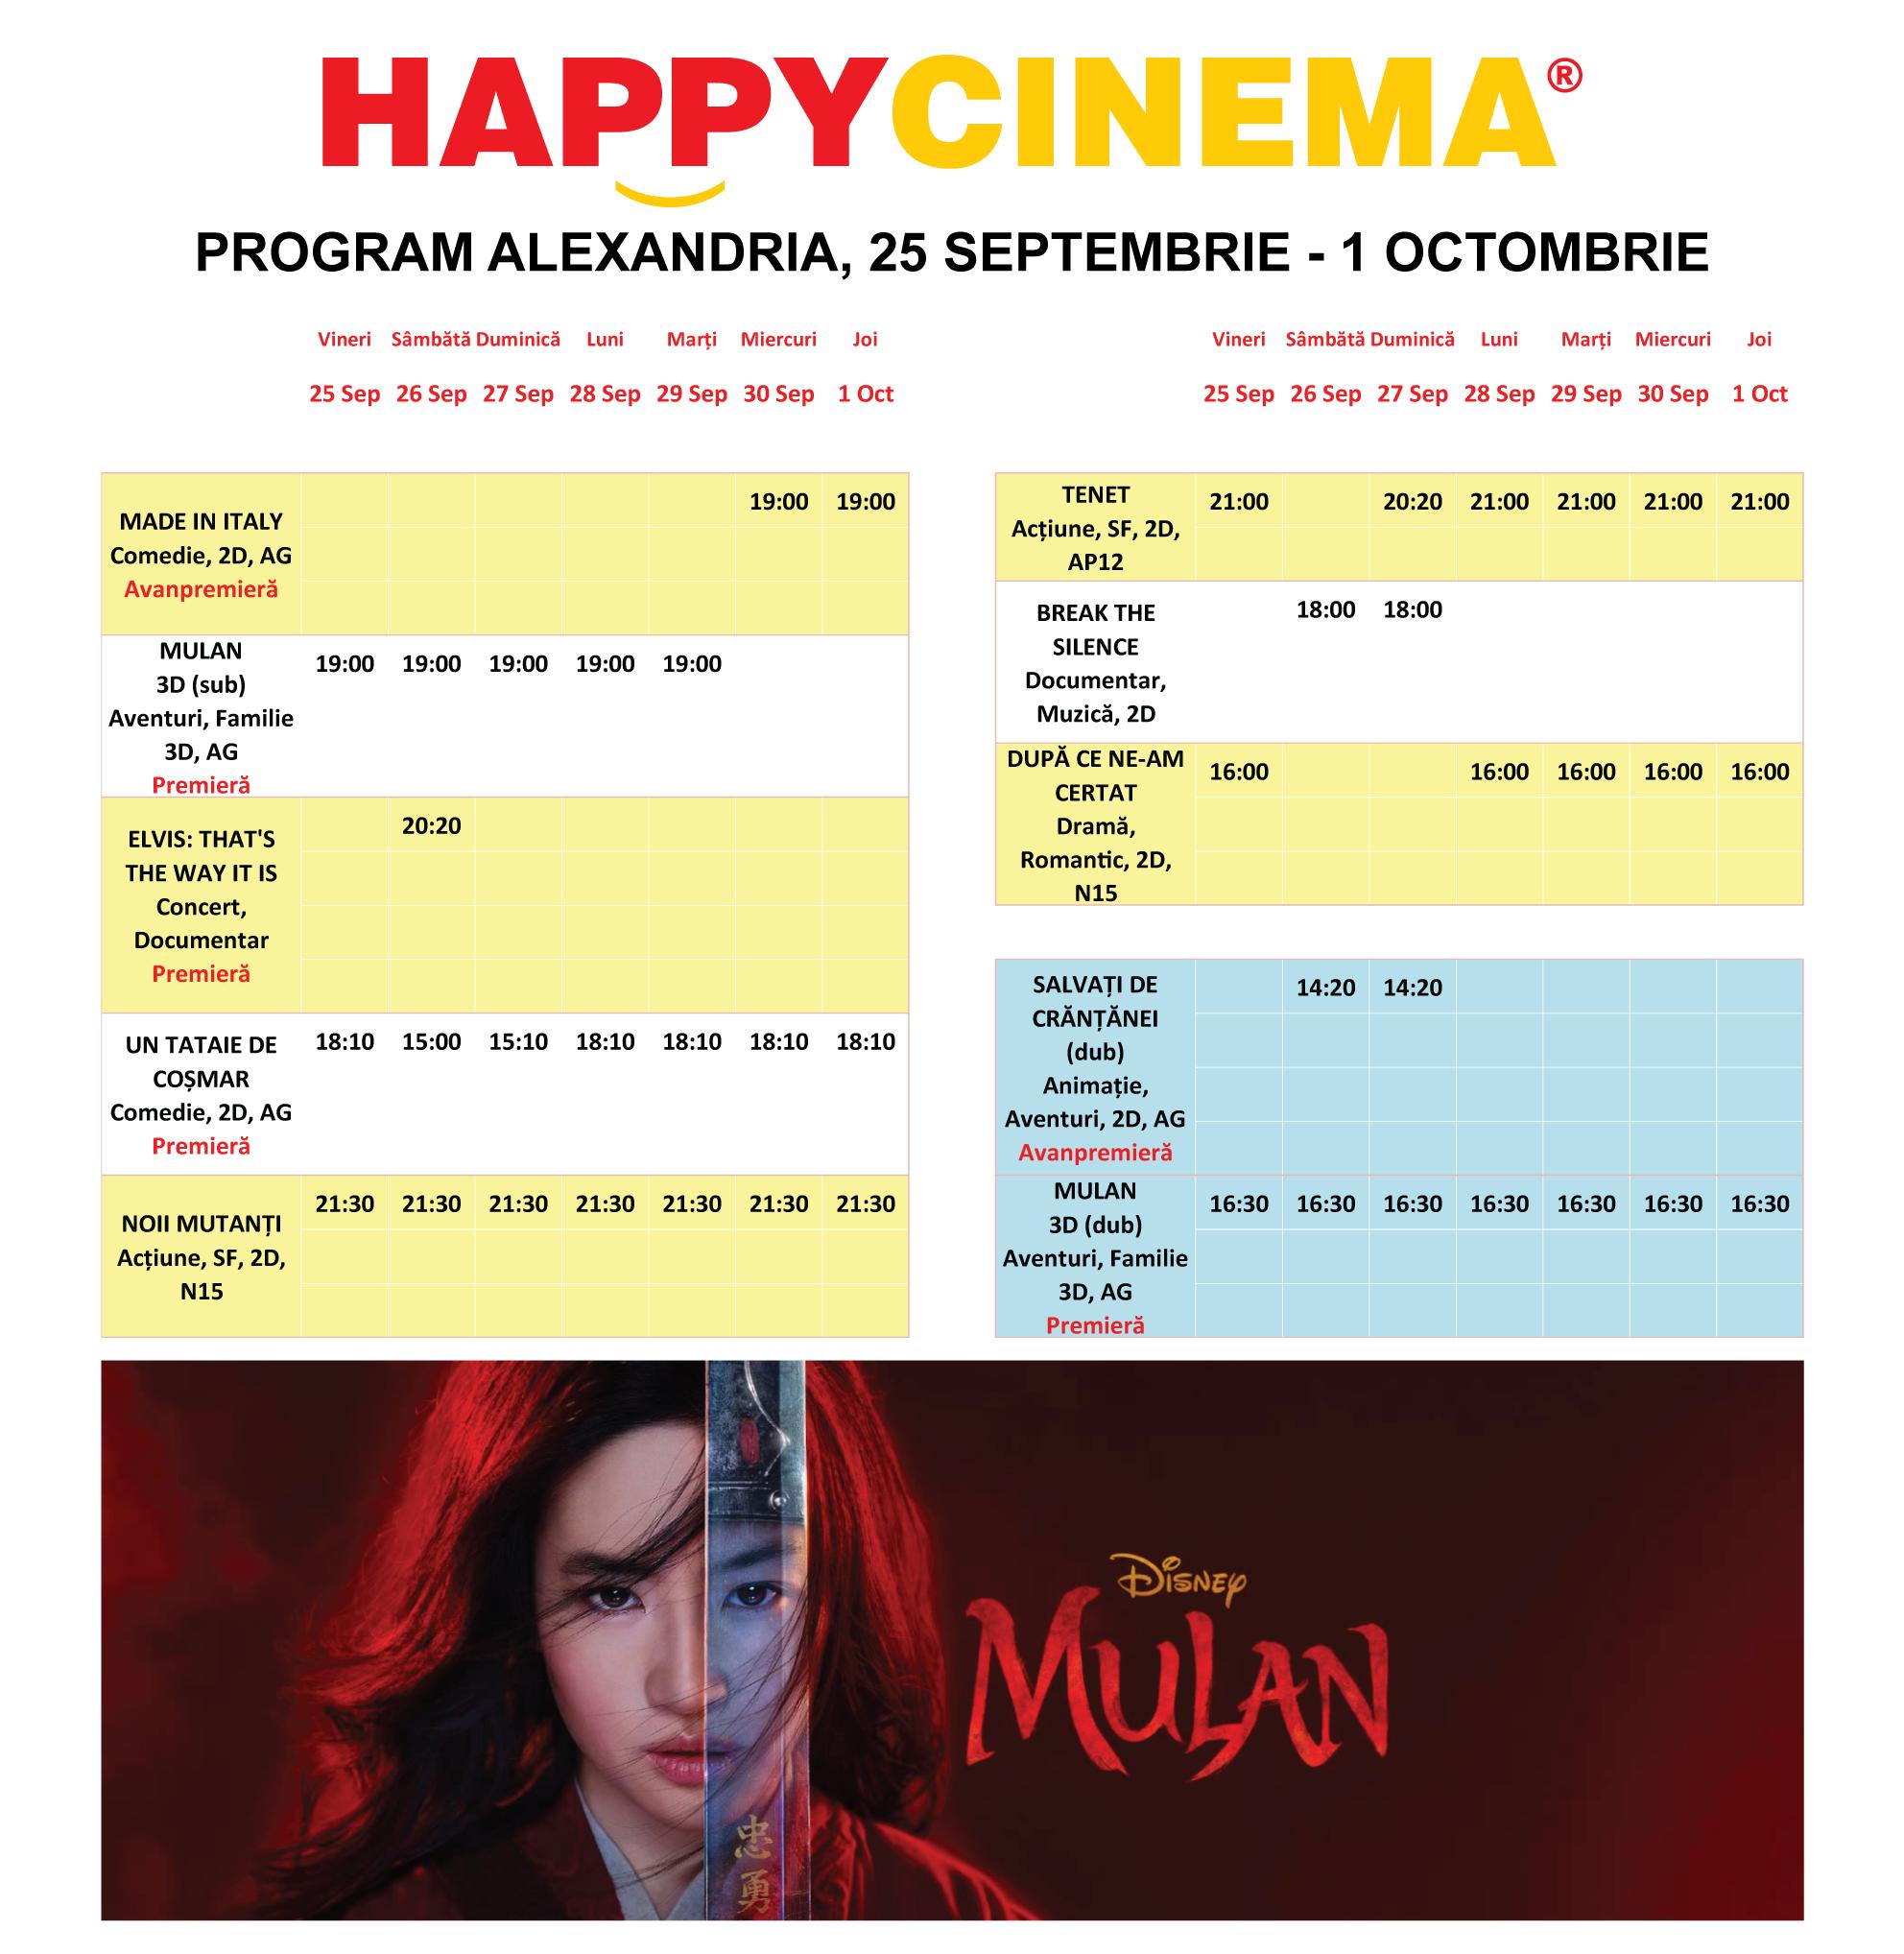 Programul filmelor la Happy Cinema Alexandria, perioada 25 septembrie – 1 octombrie